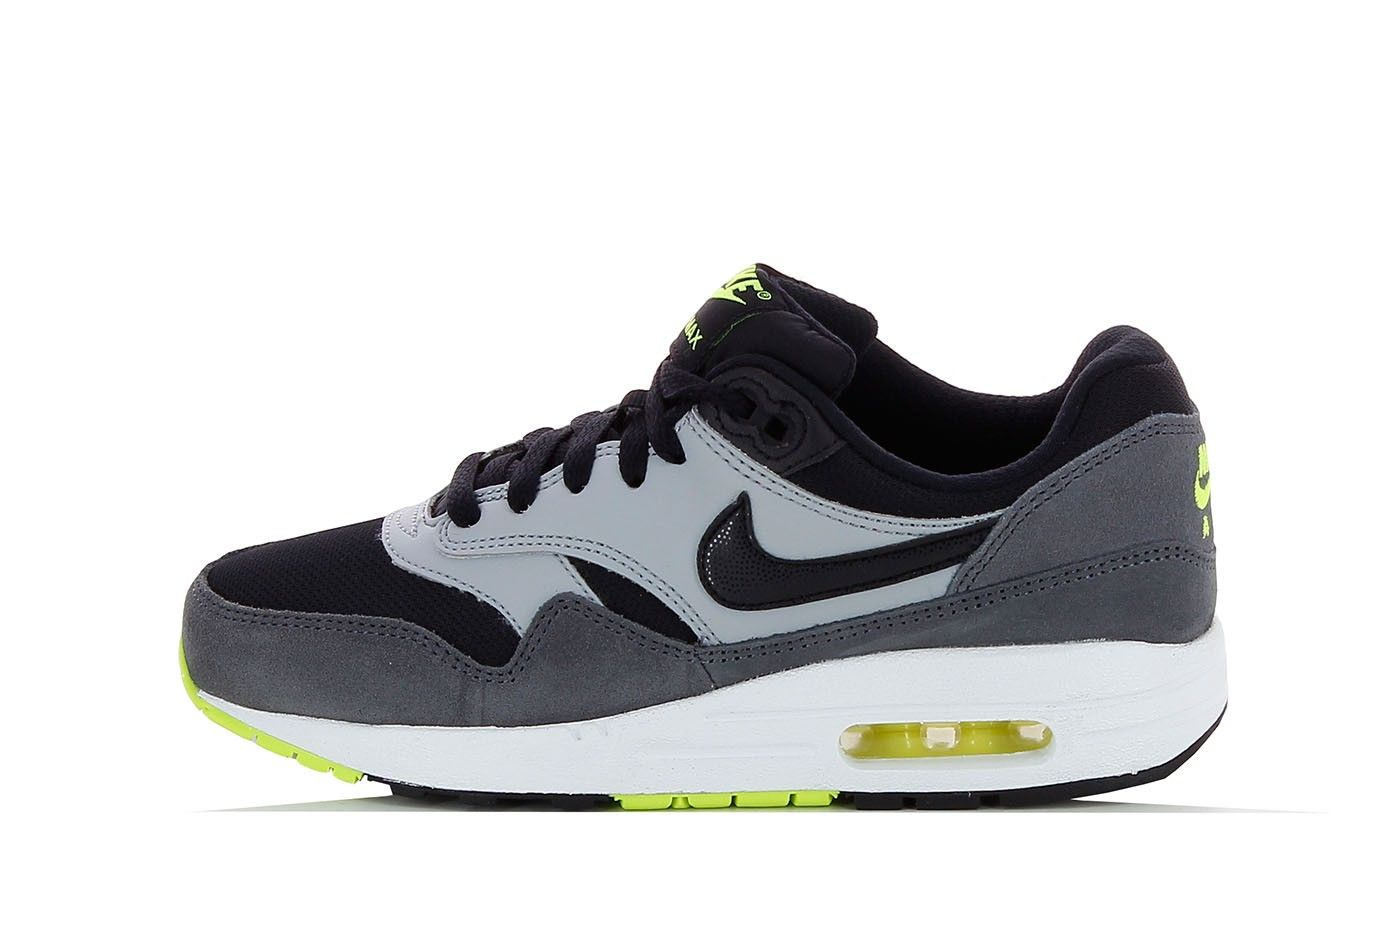 online store 59ffd 70021 Basket Nike Air Max 1 (GS) - 555766-047 - Pegashoes